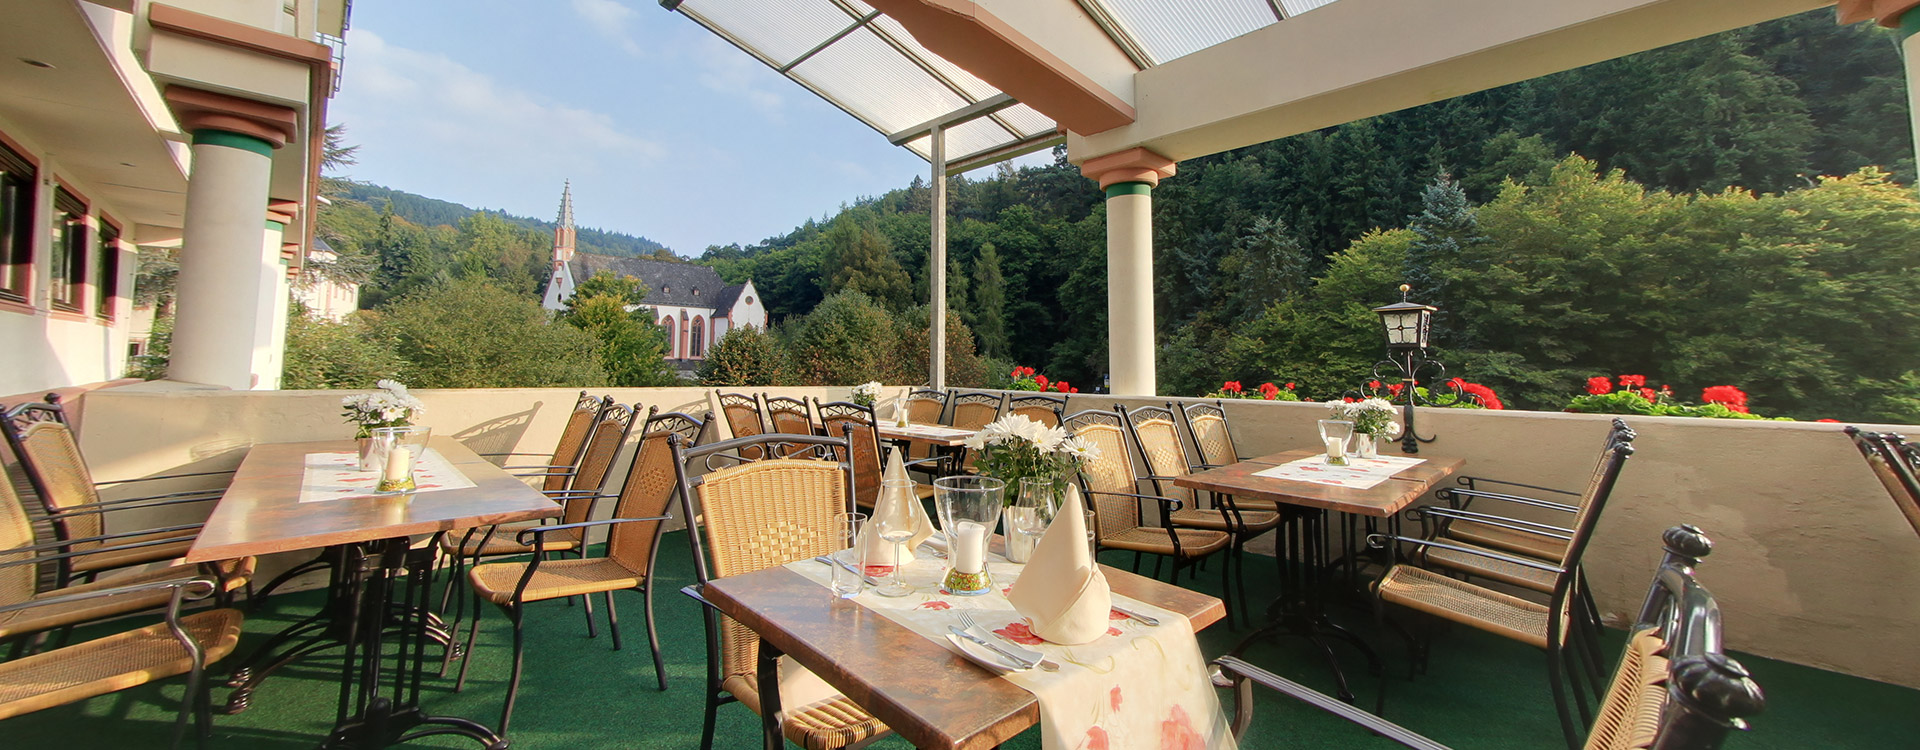 akzent_waldhotel_rheingau_geisenheim_terrasse_01